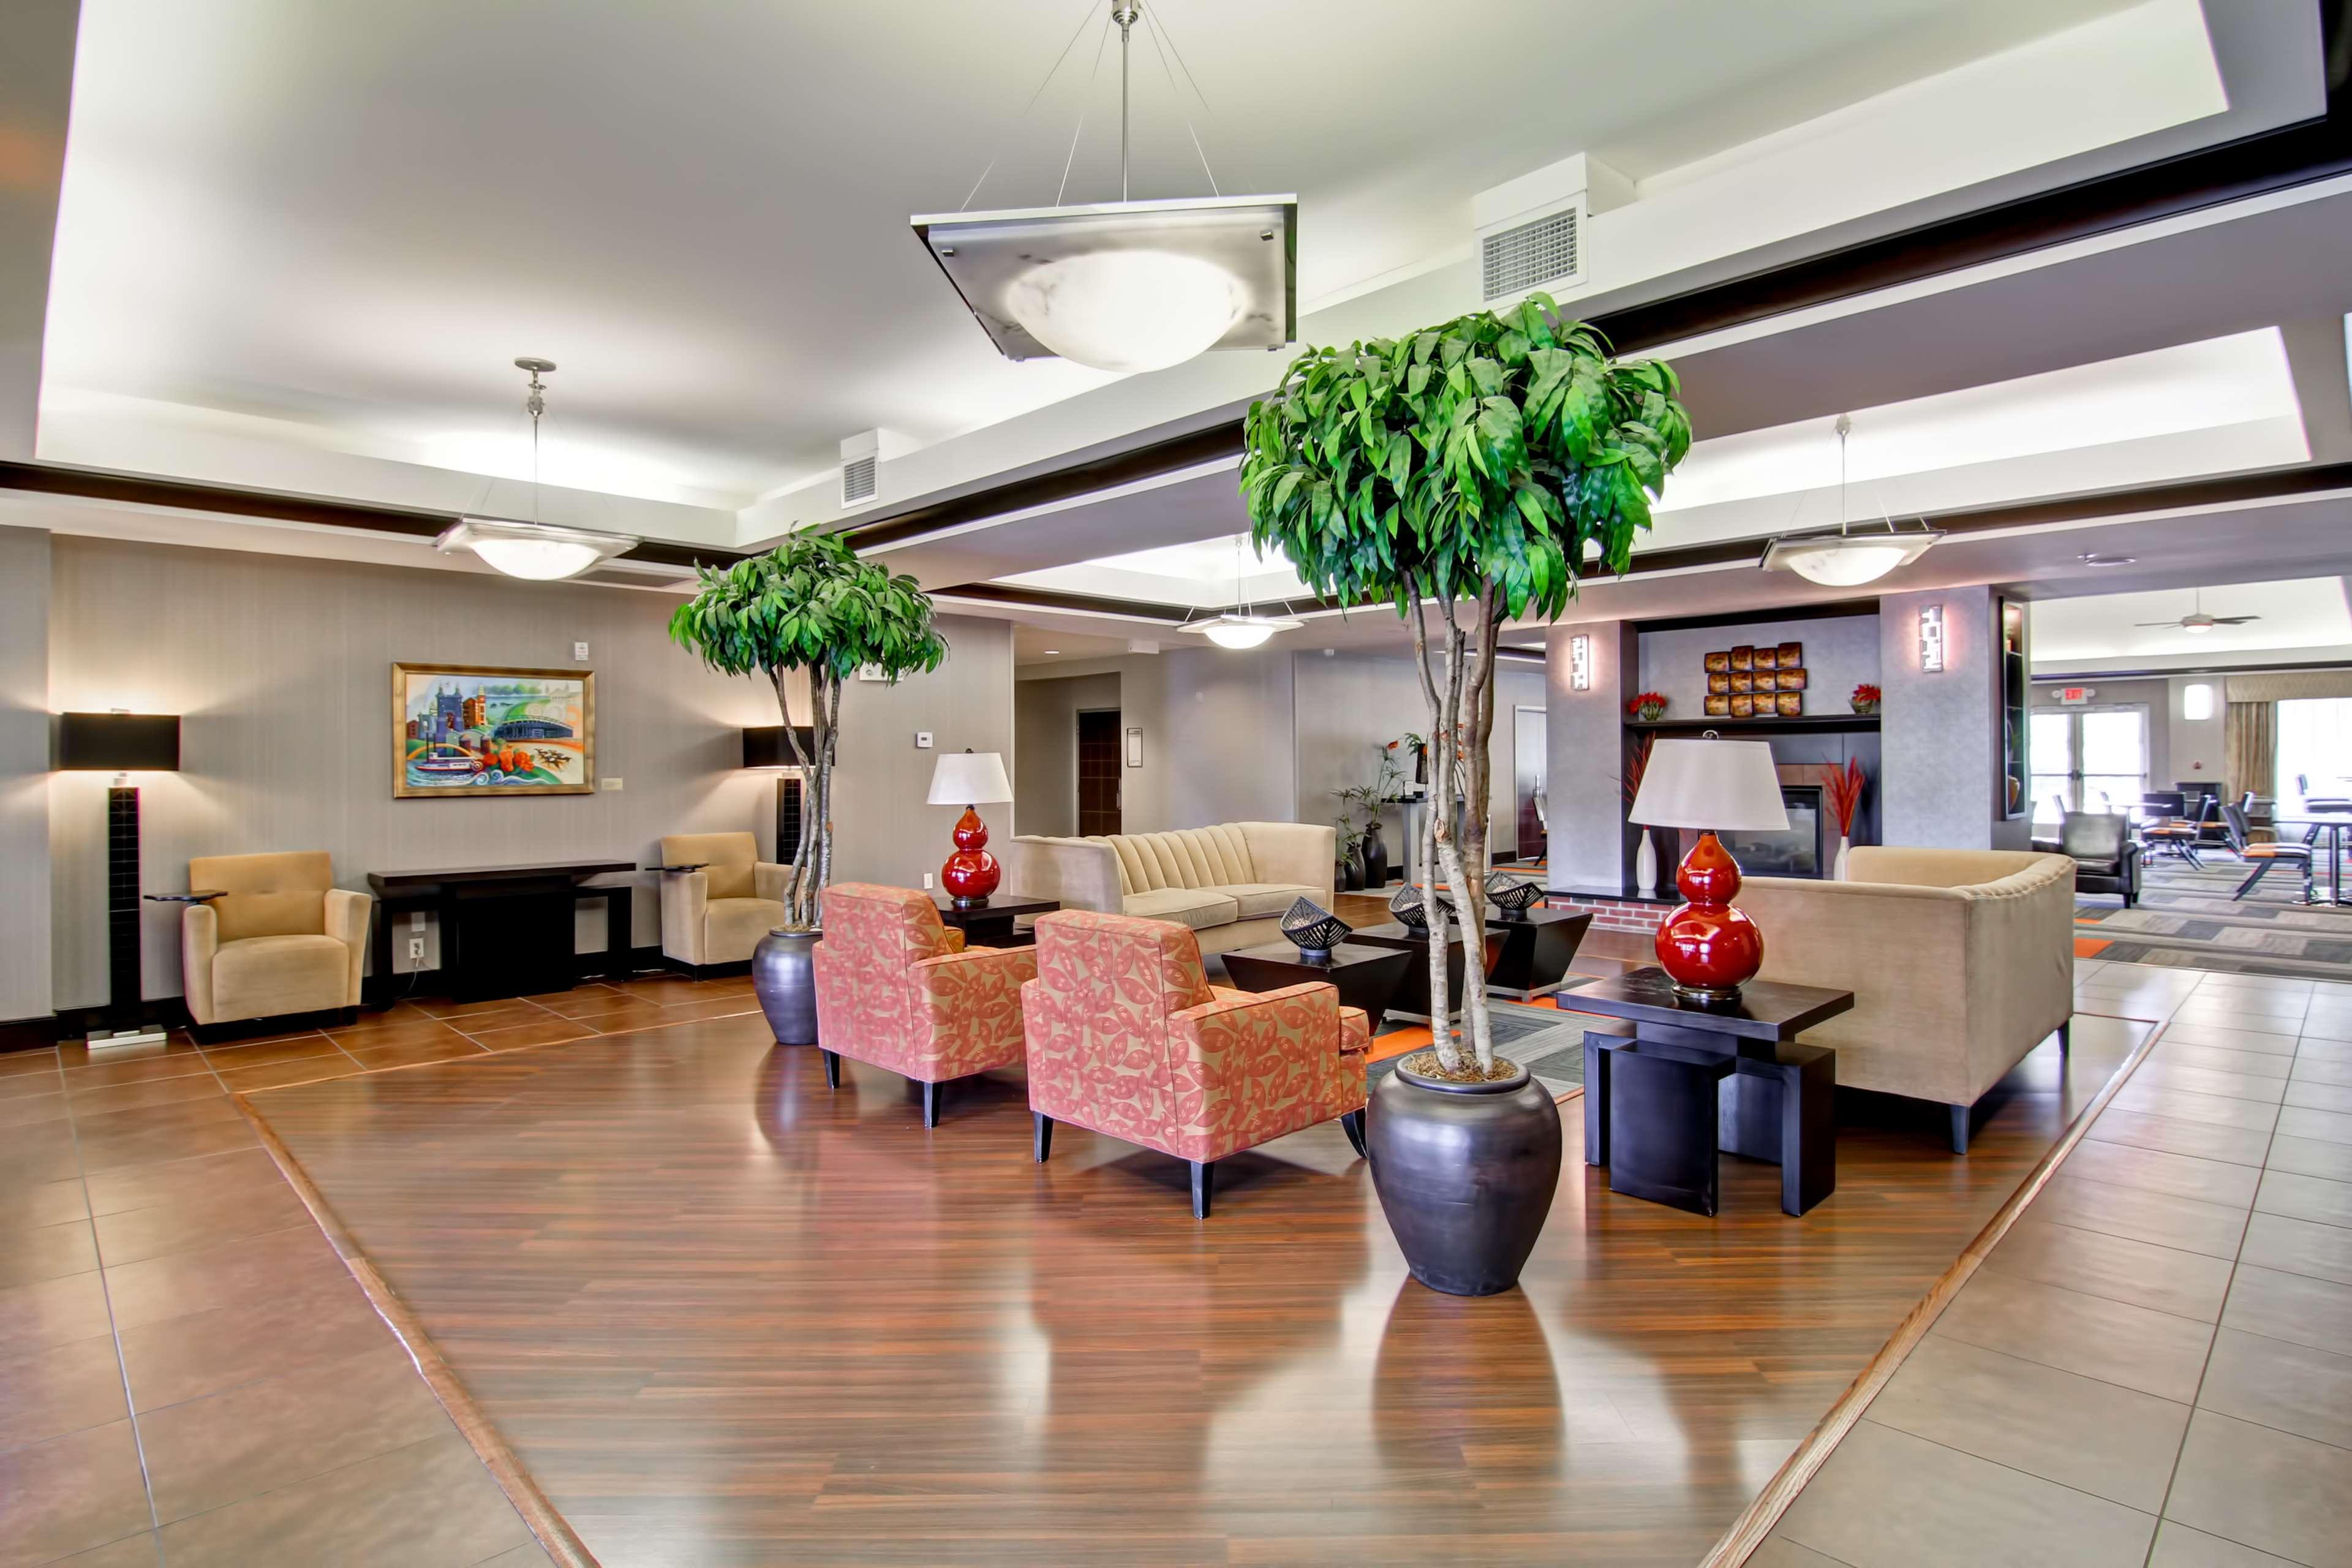 homewood suites by hilton cincinnati airport south. Black Bedroom Furniture Sets. Home Design Ideas